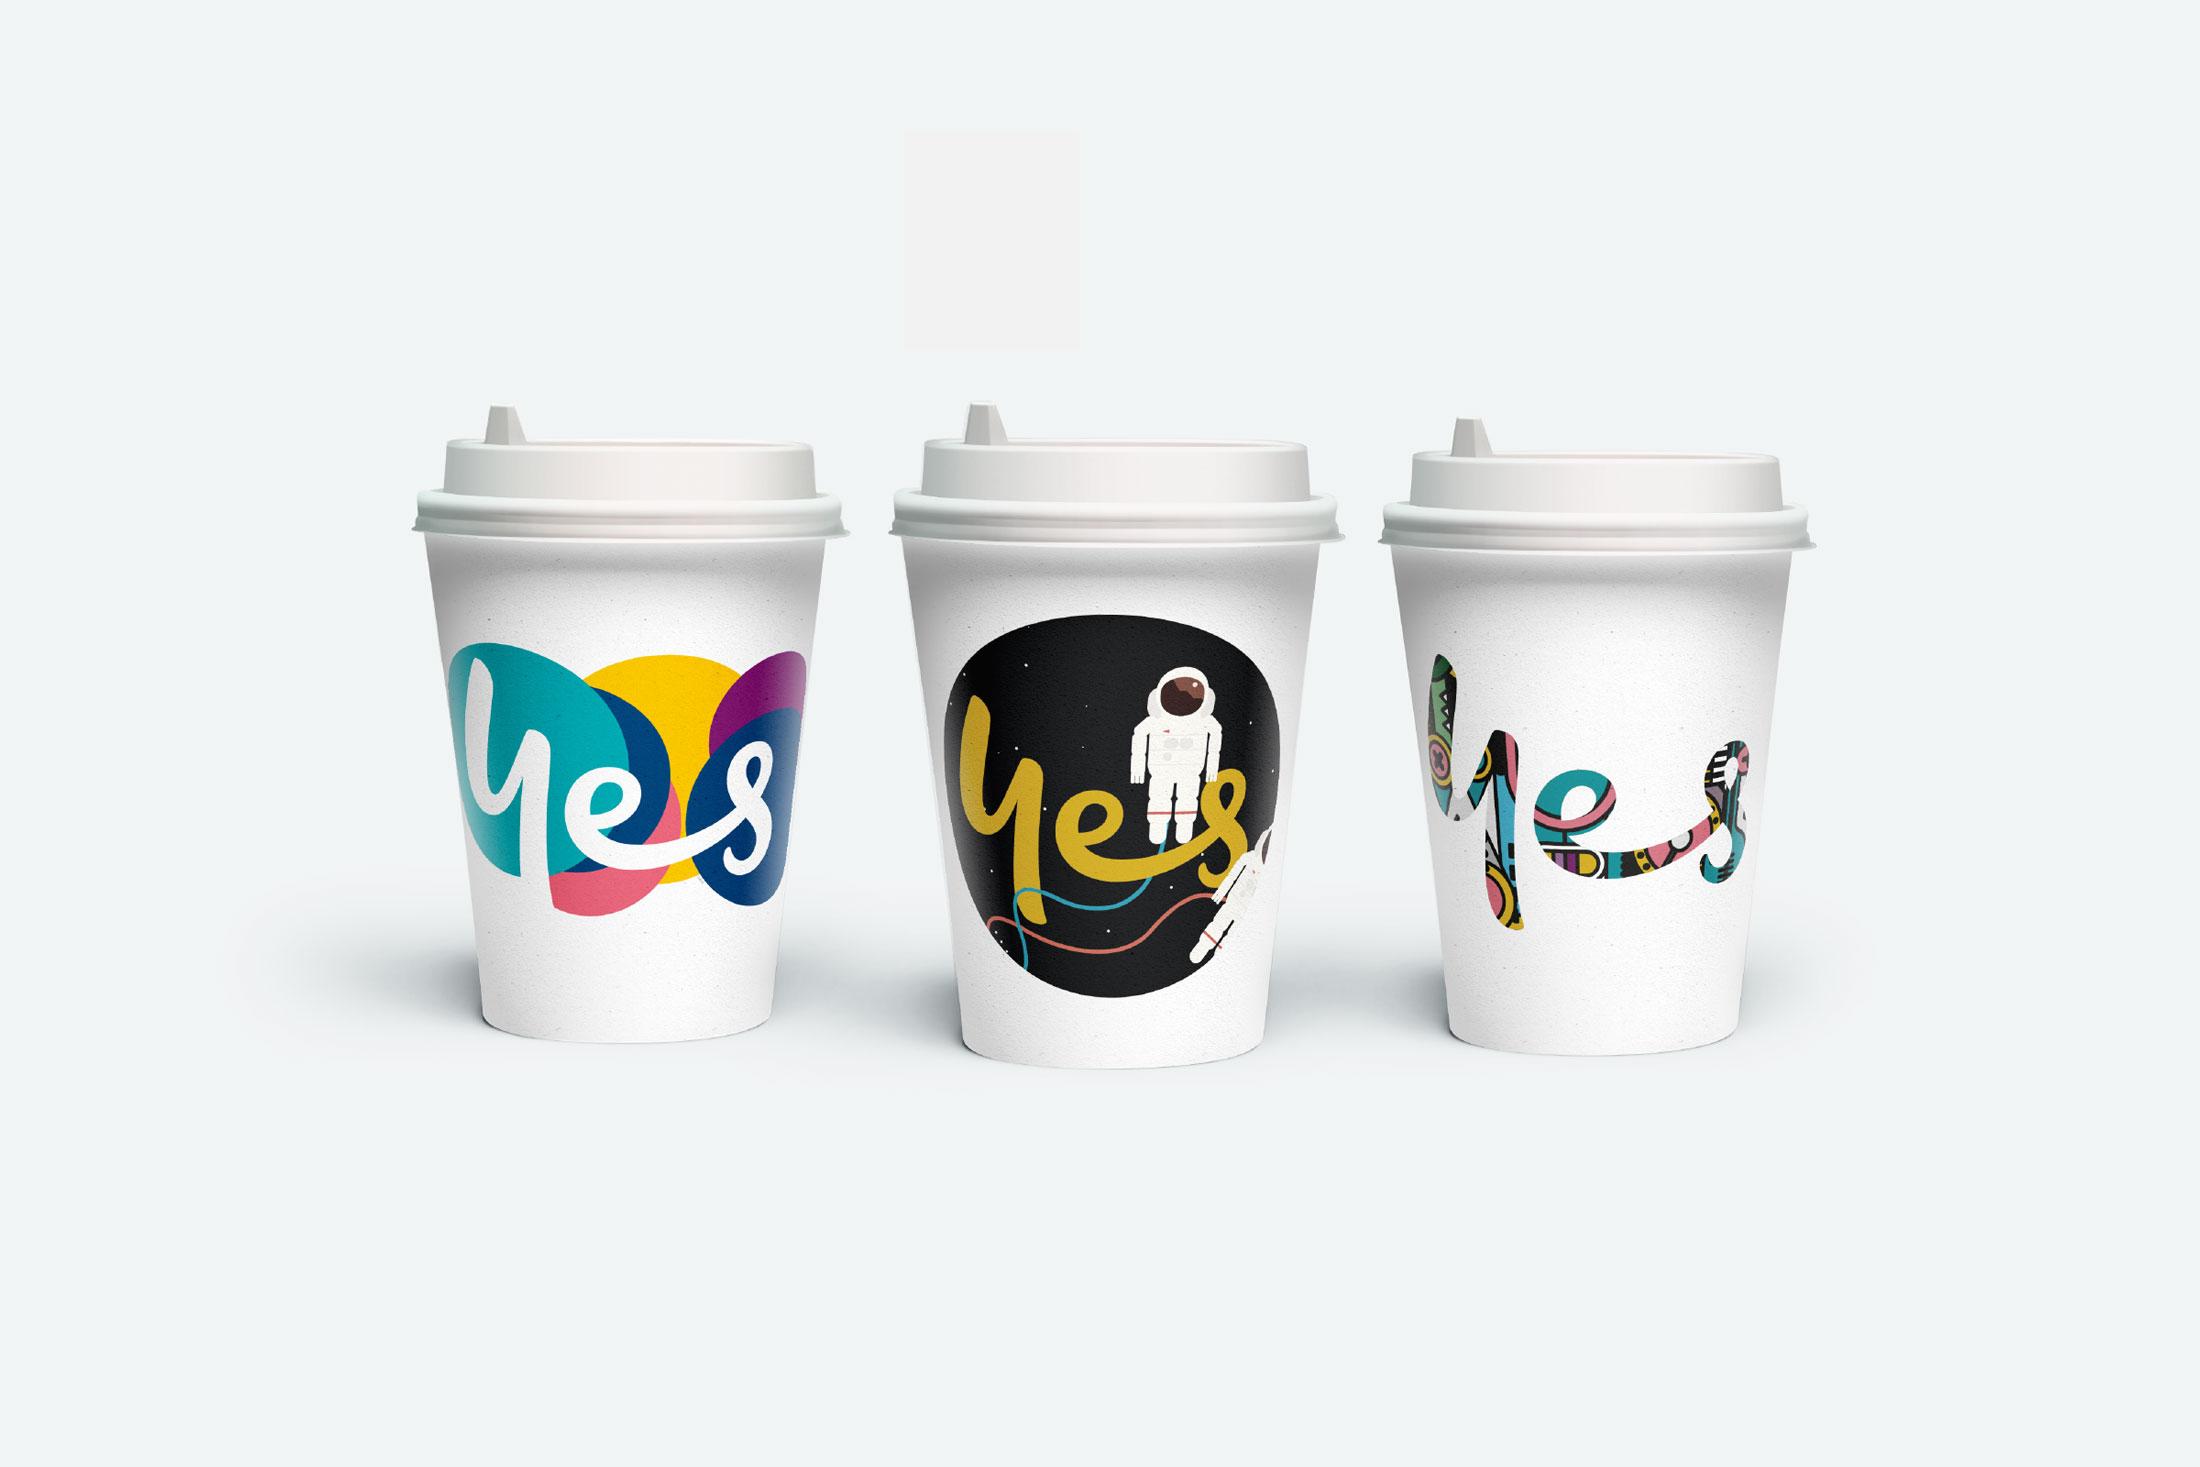 Optus-Identity-Plastic-Cups.jpg